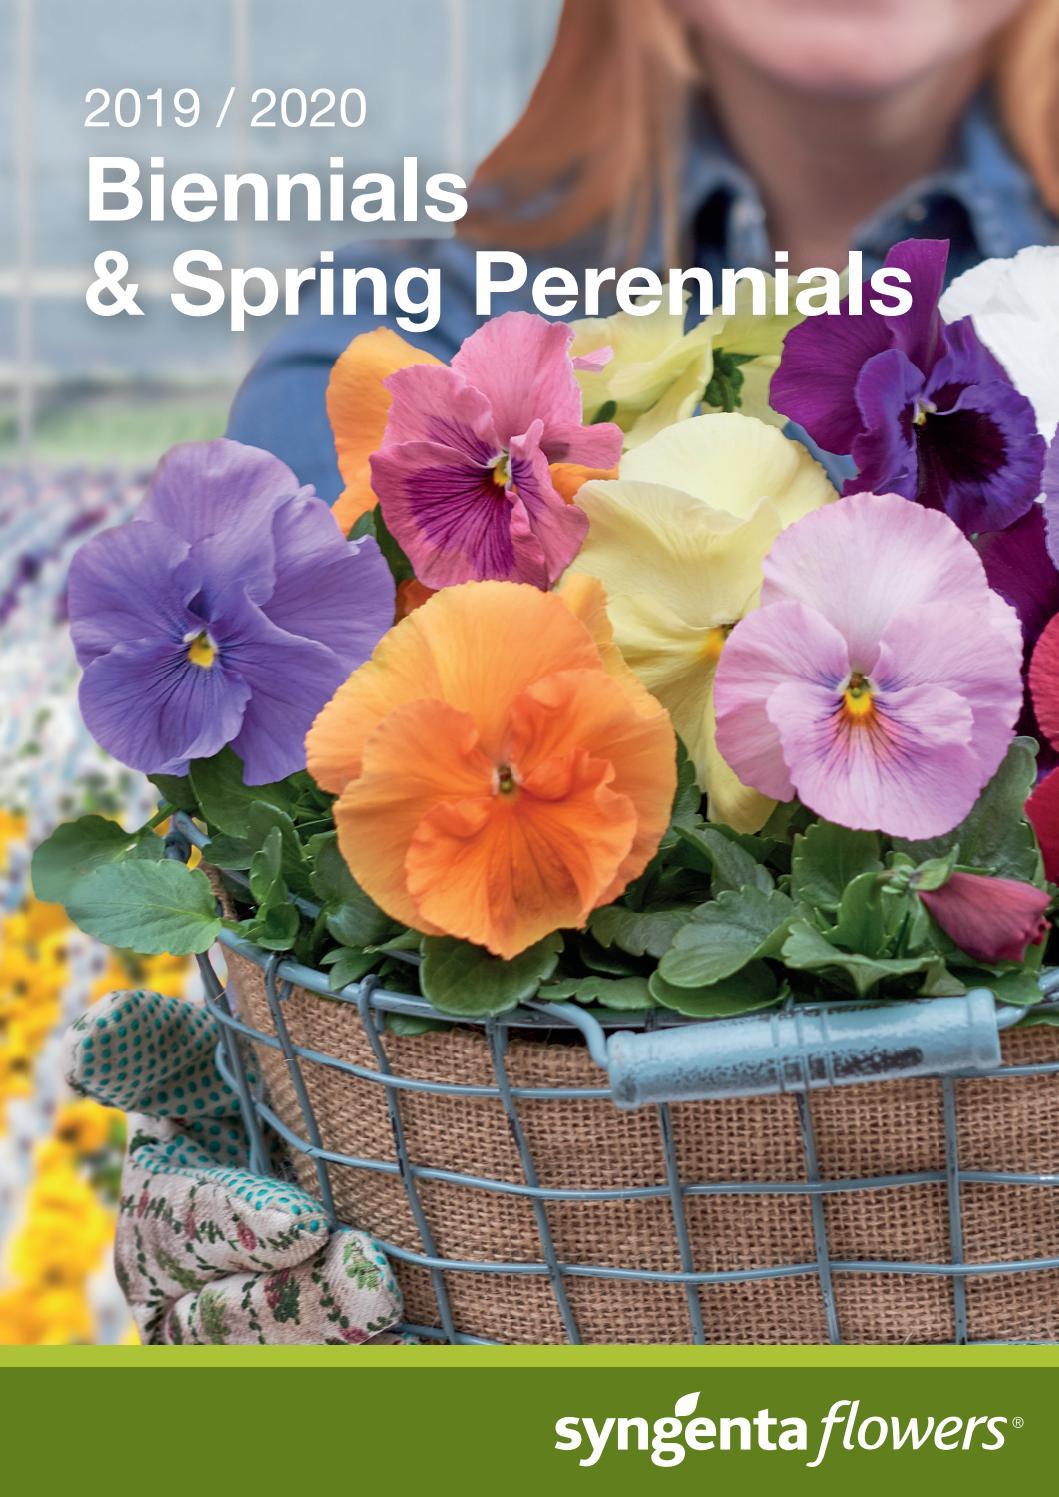 40 Winter Flowering Pansy F1 Select Blue Blotch  Basket Bedding  Plug plants